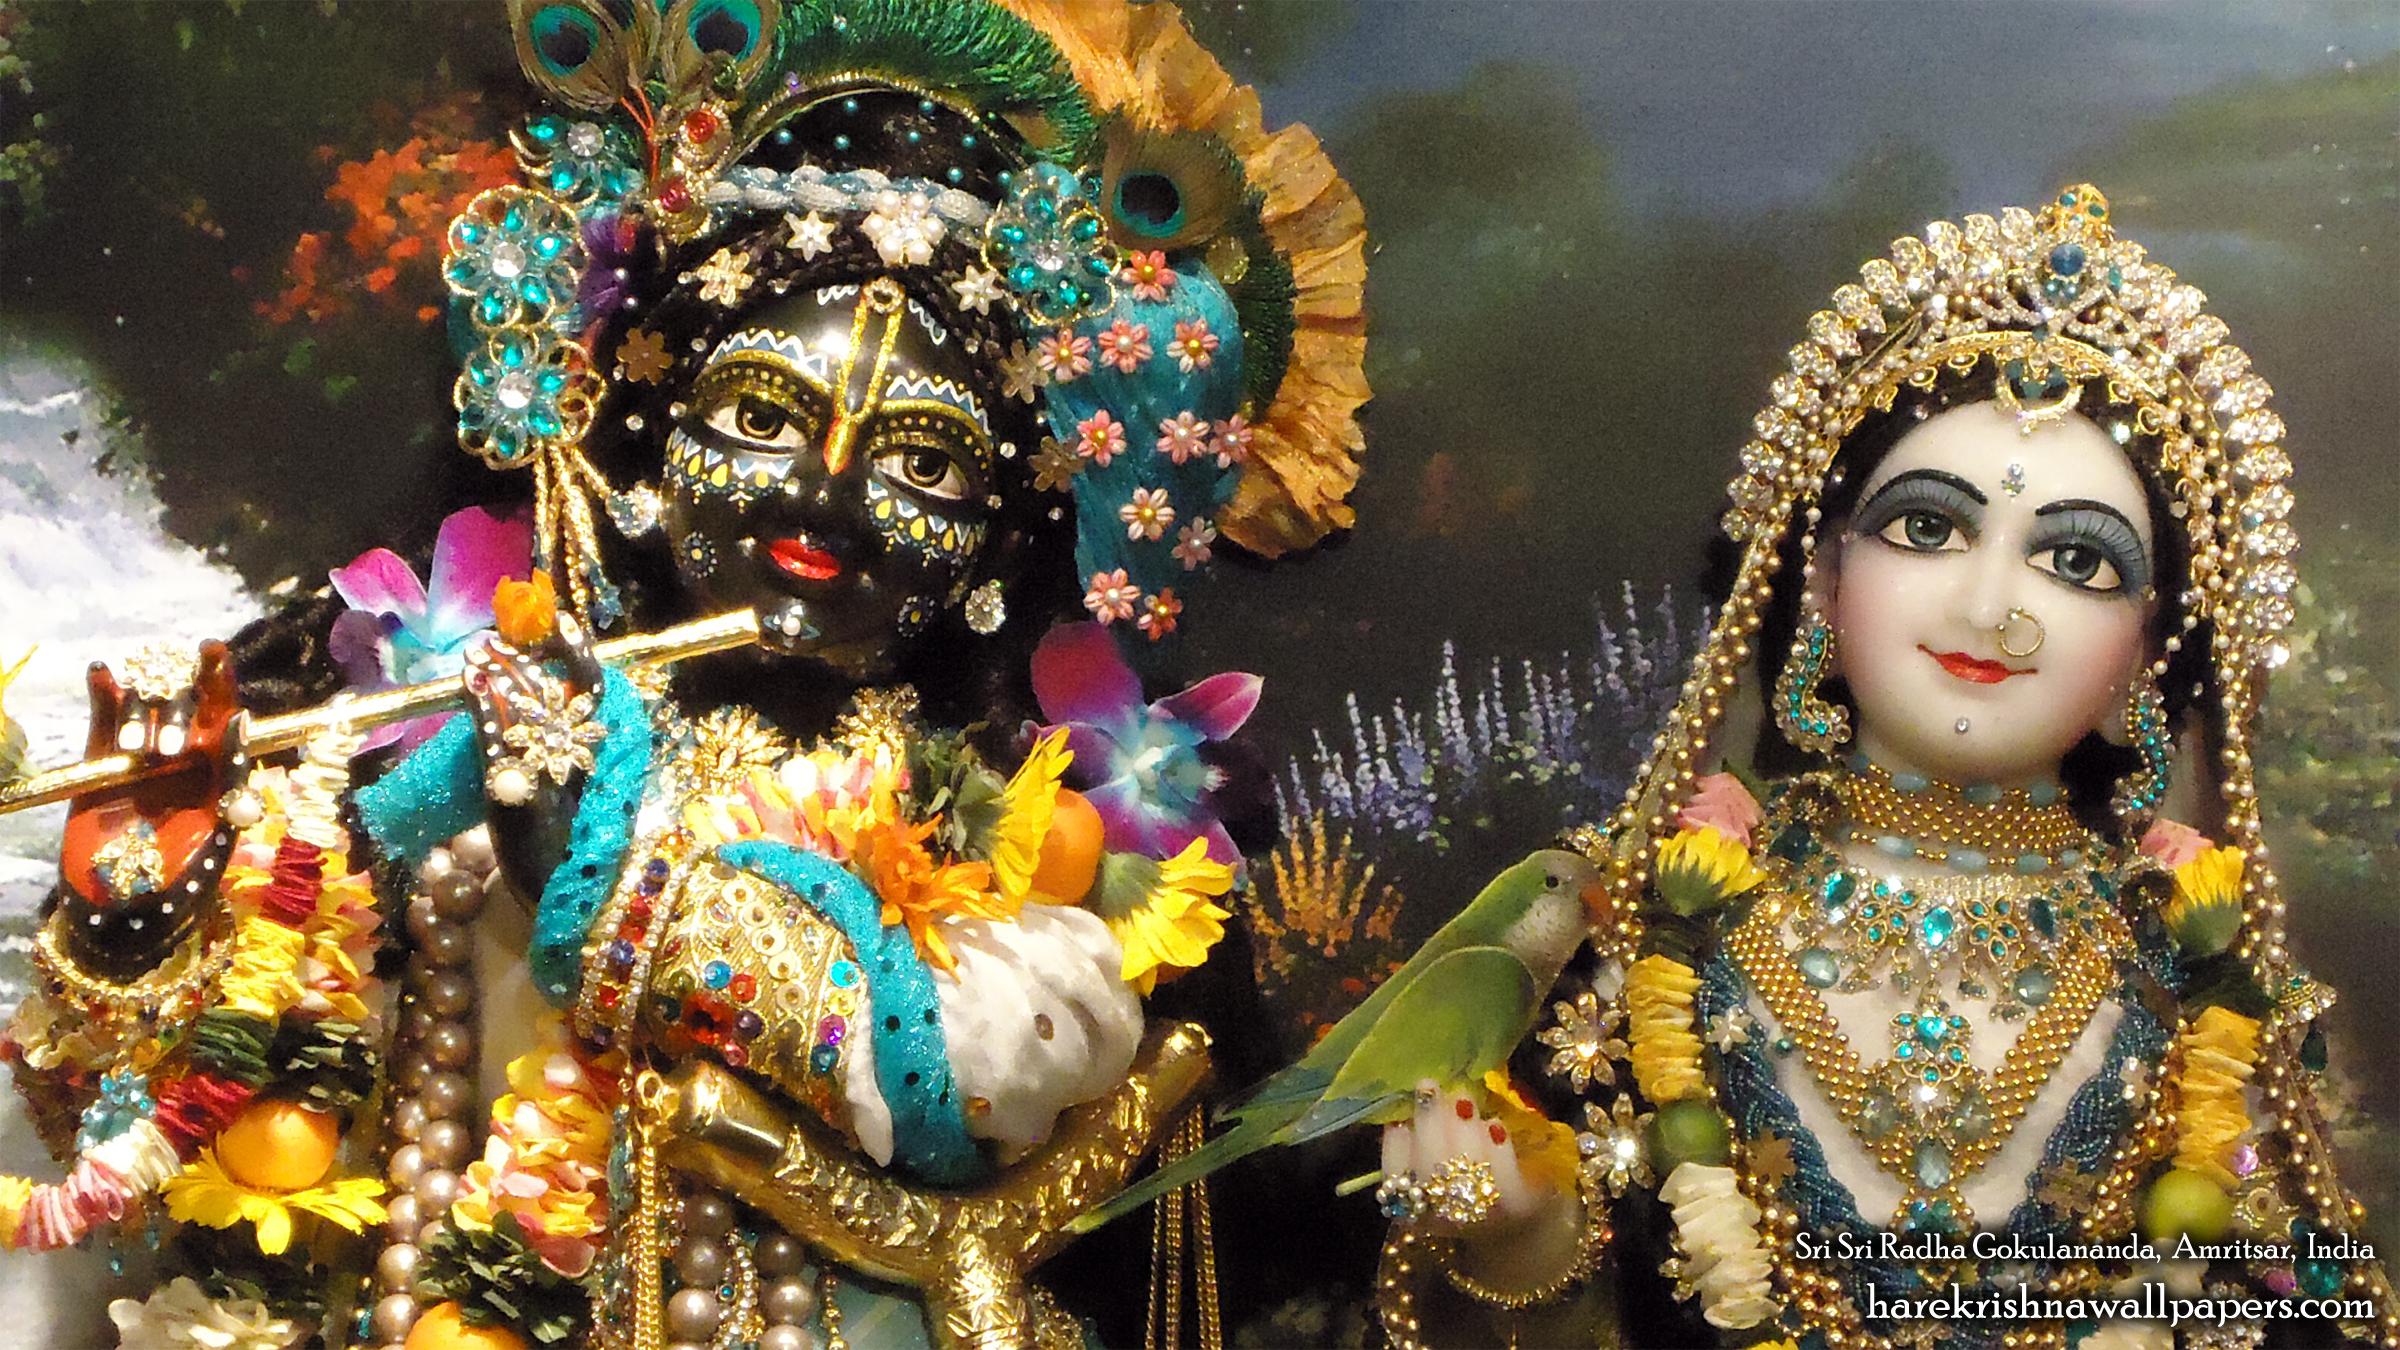 Sri Sri Radha Gokulananda Close up Wallpaper (007) Size 2400x1350 Download